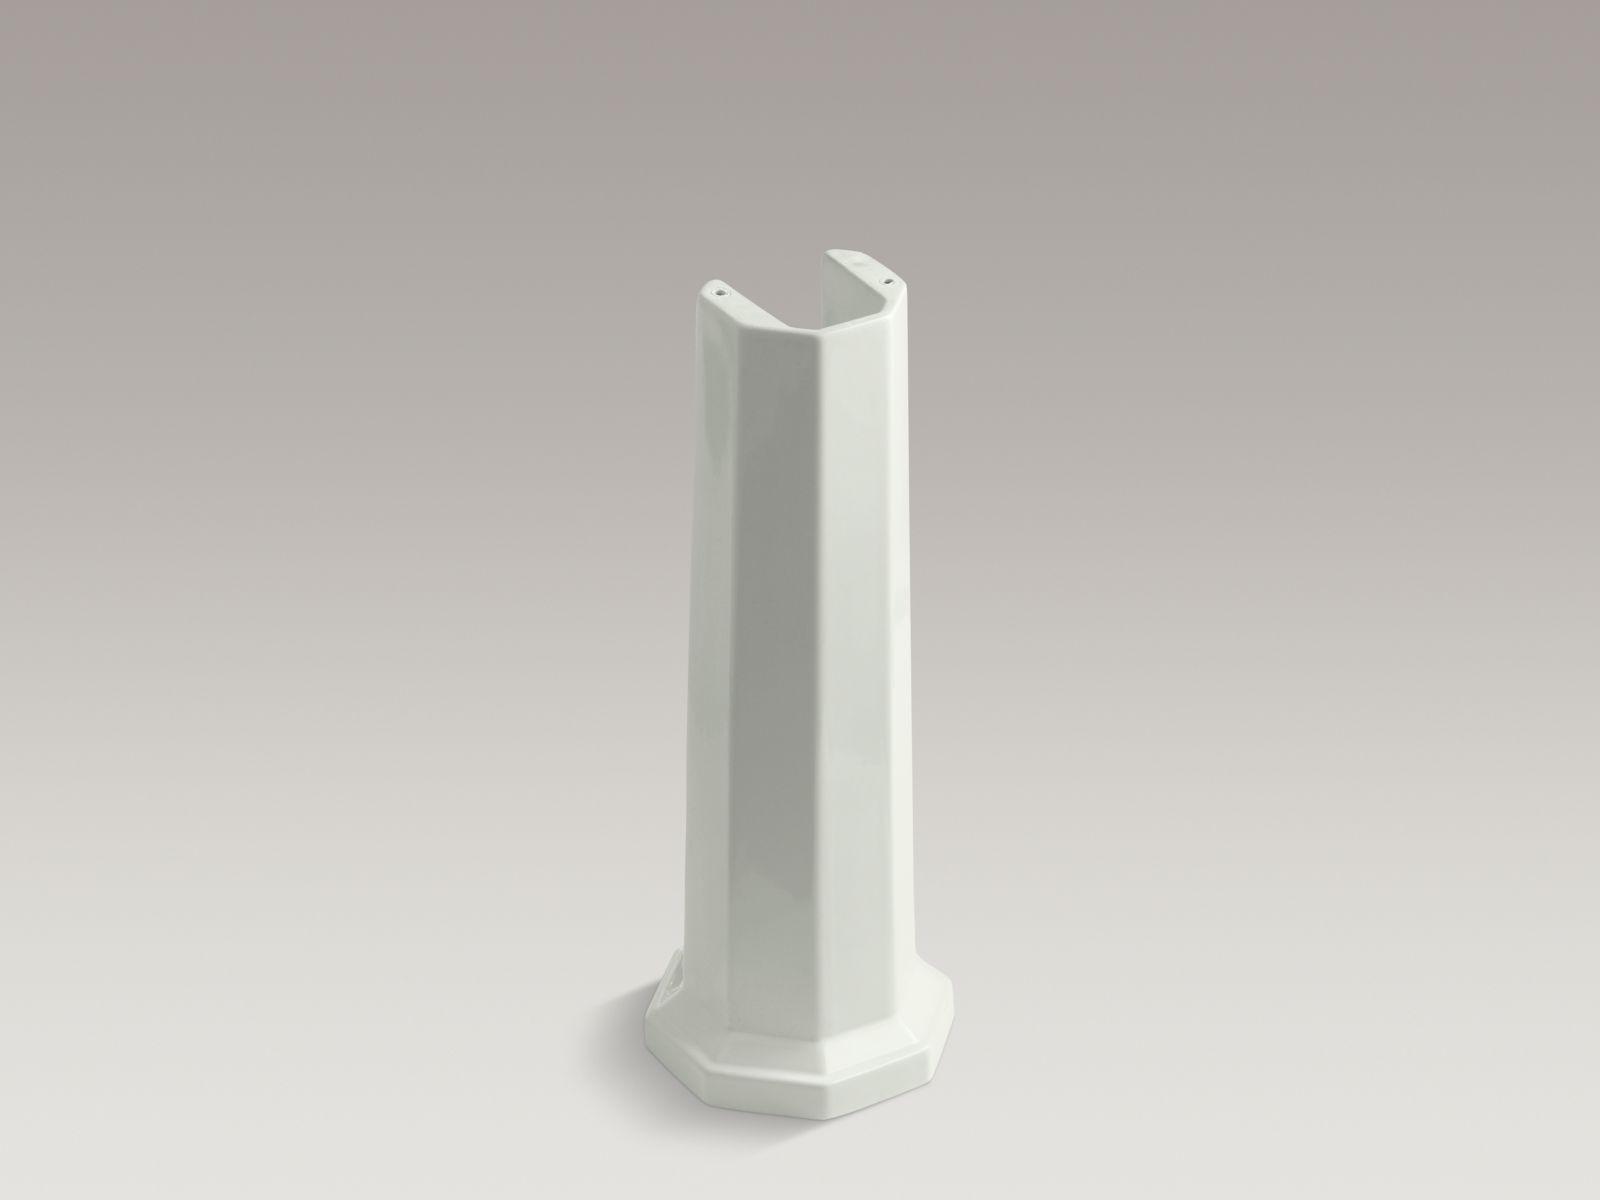 Kohler K-2324-NY Kathryn Lavatory Pedestal Dune